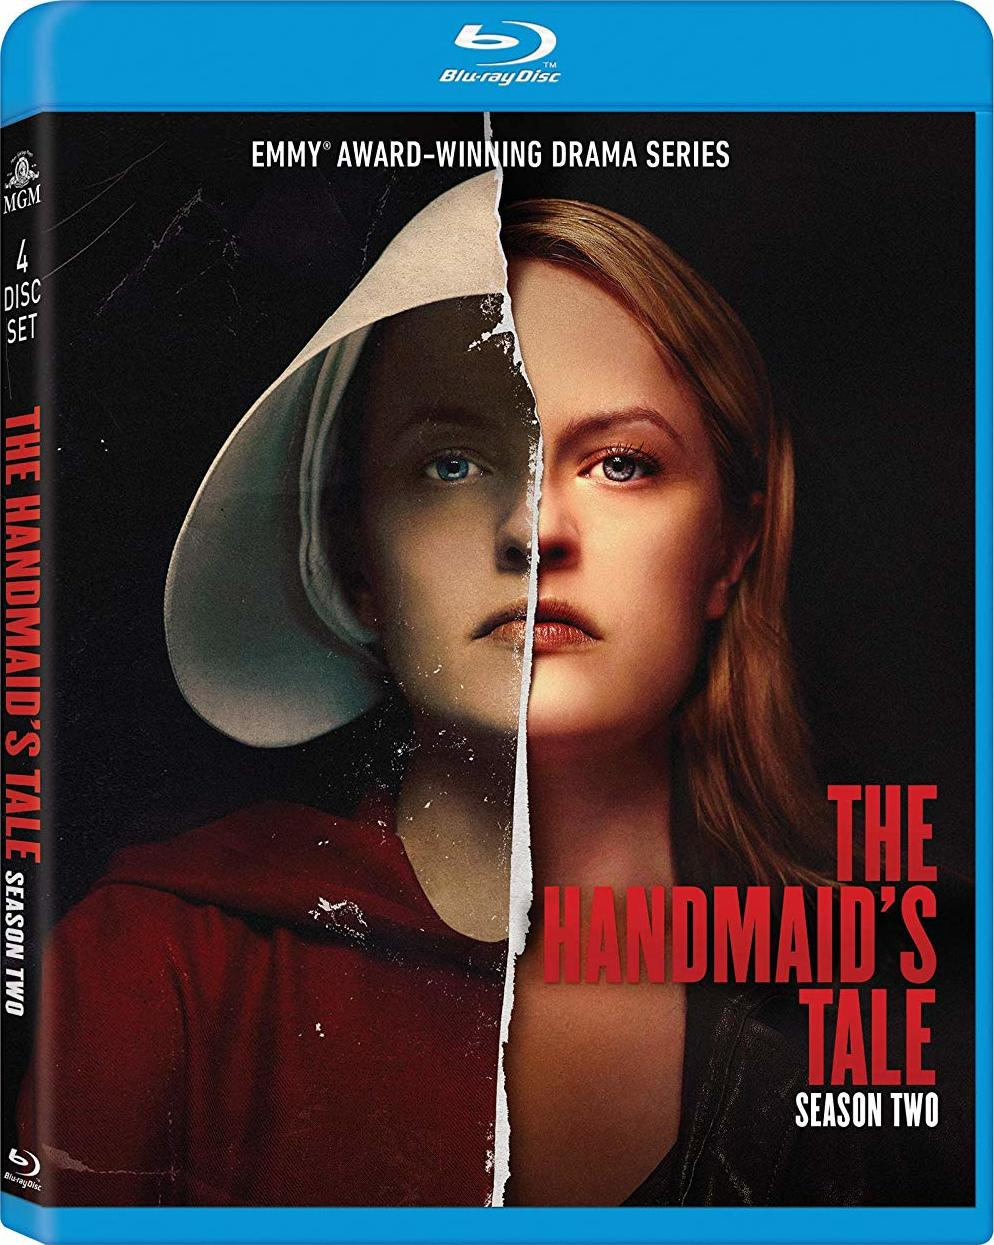 The Handmaid's Tale: Season Two (Blu-ray)(Region A)